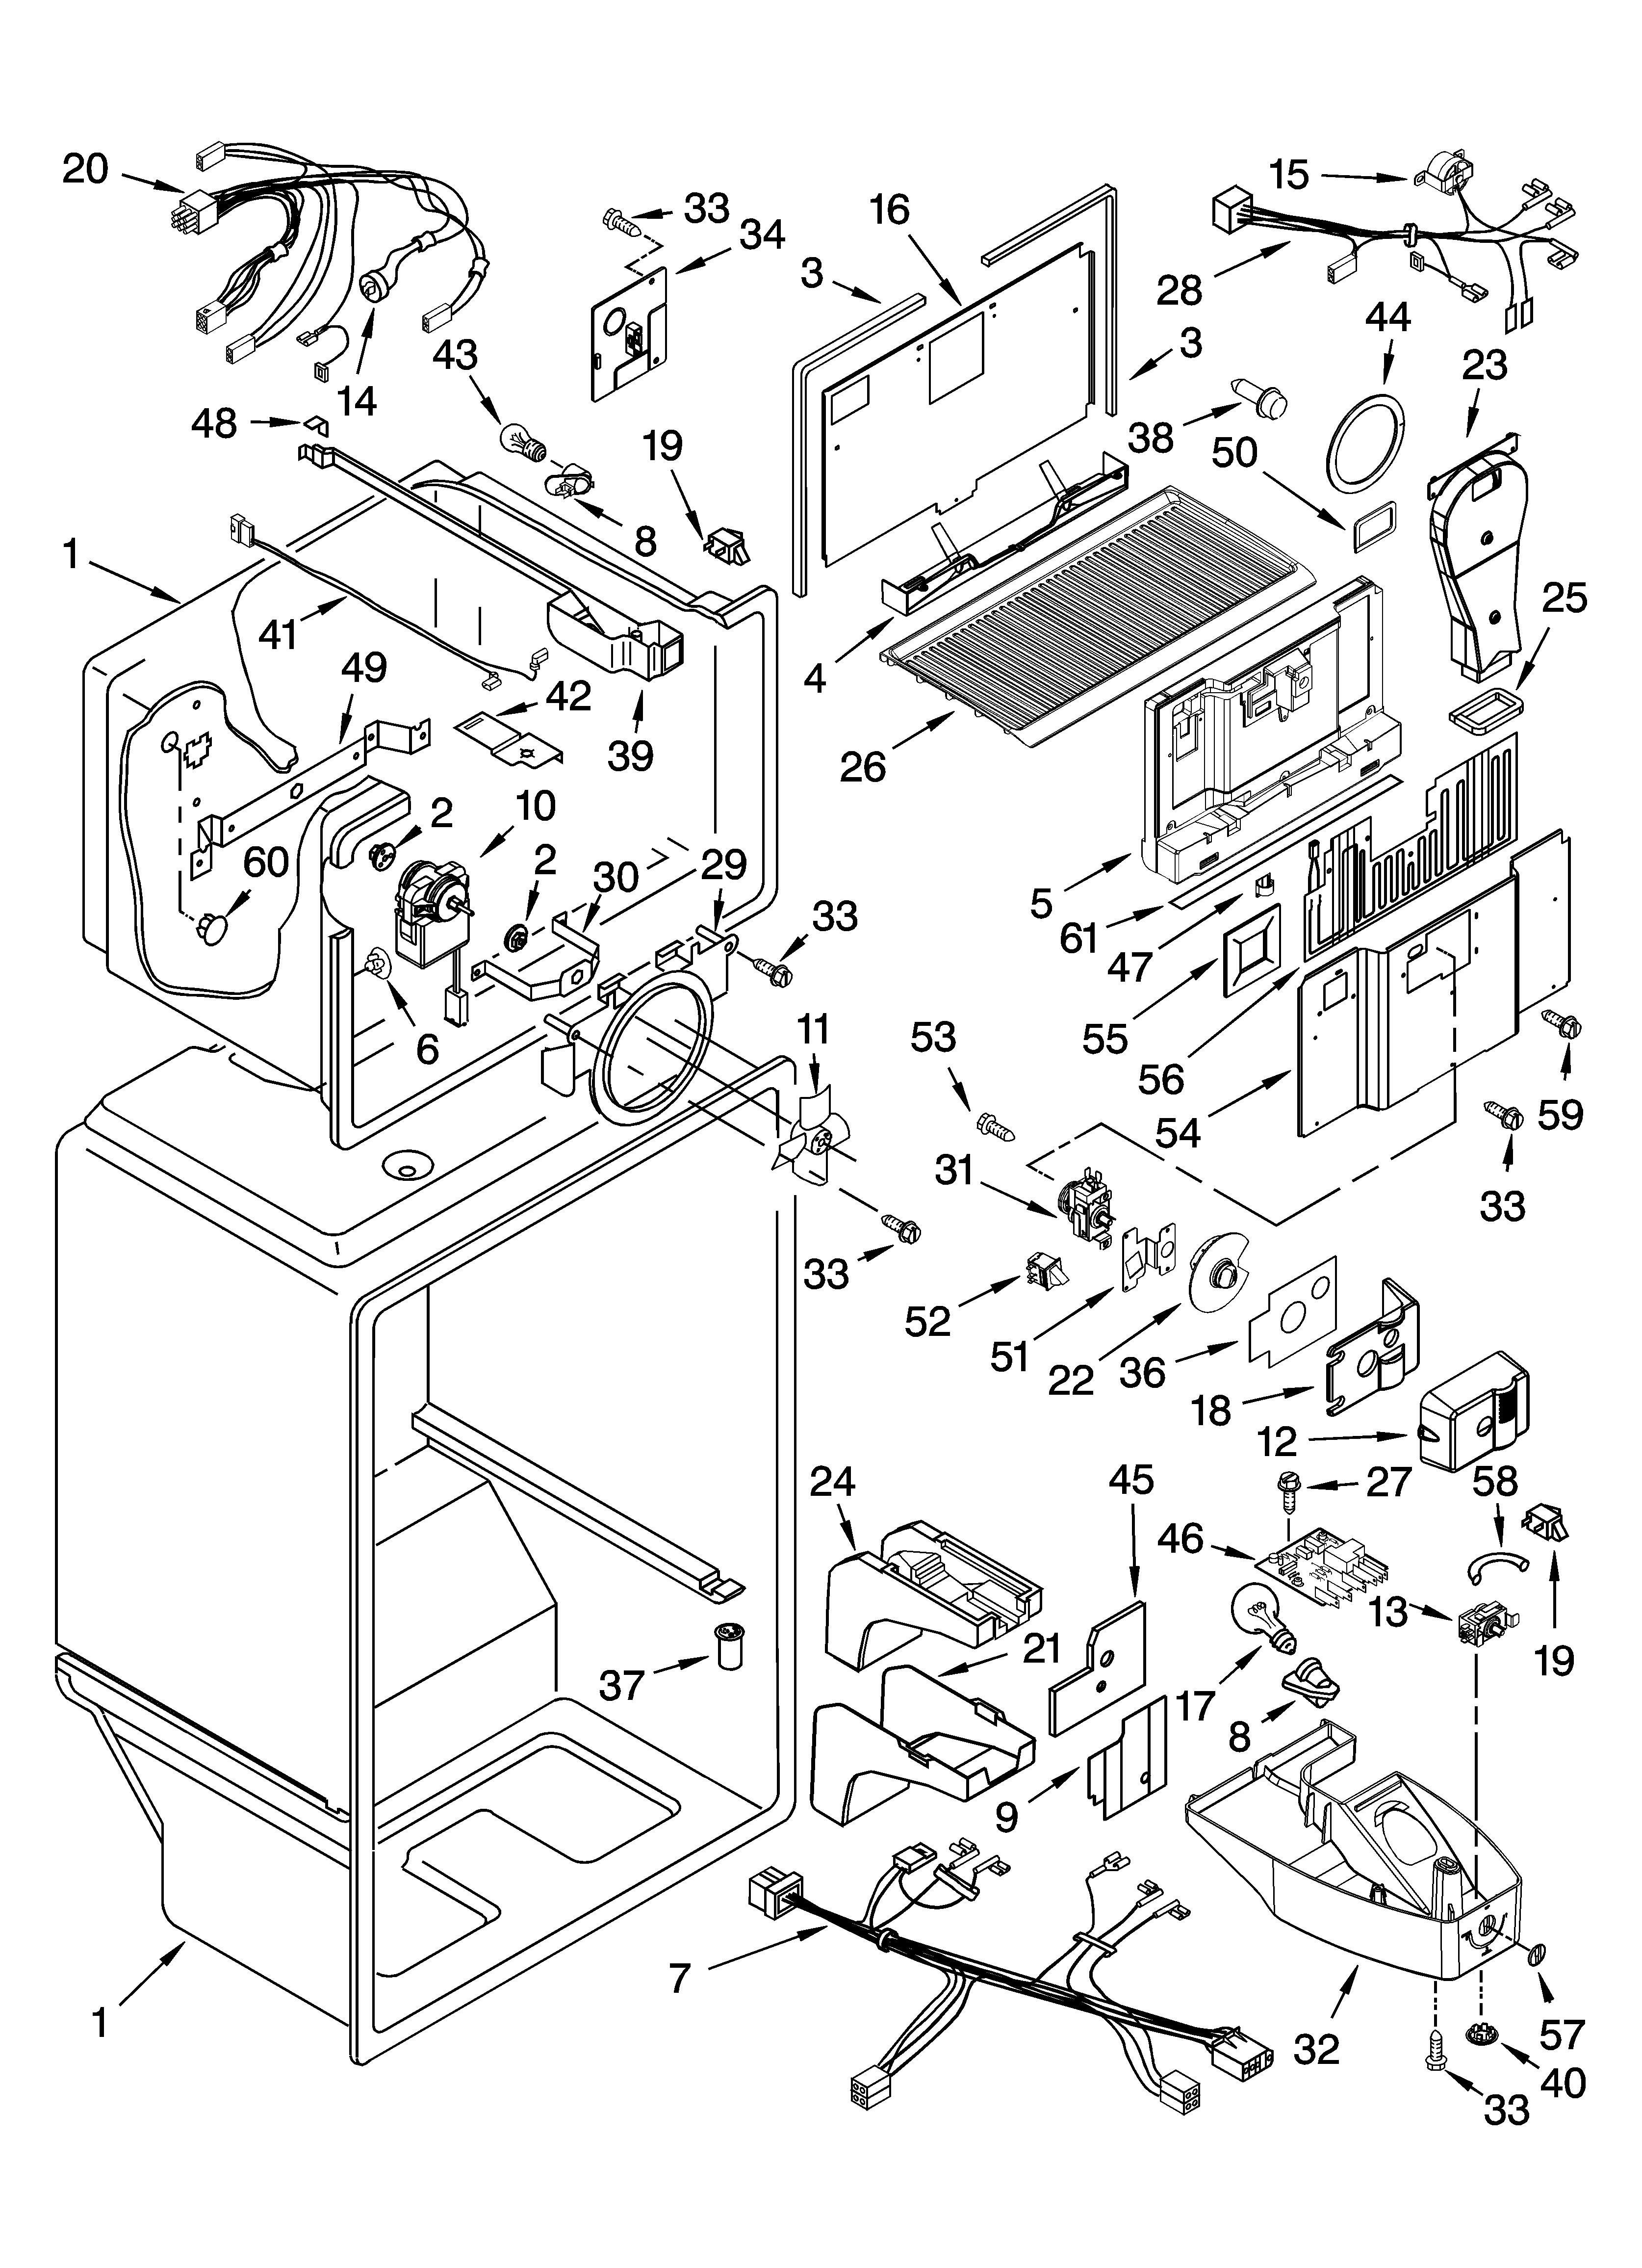 Gladiator model GAFZ21XXRK00 all refrigerator genuine parts